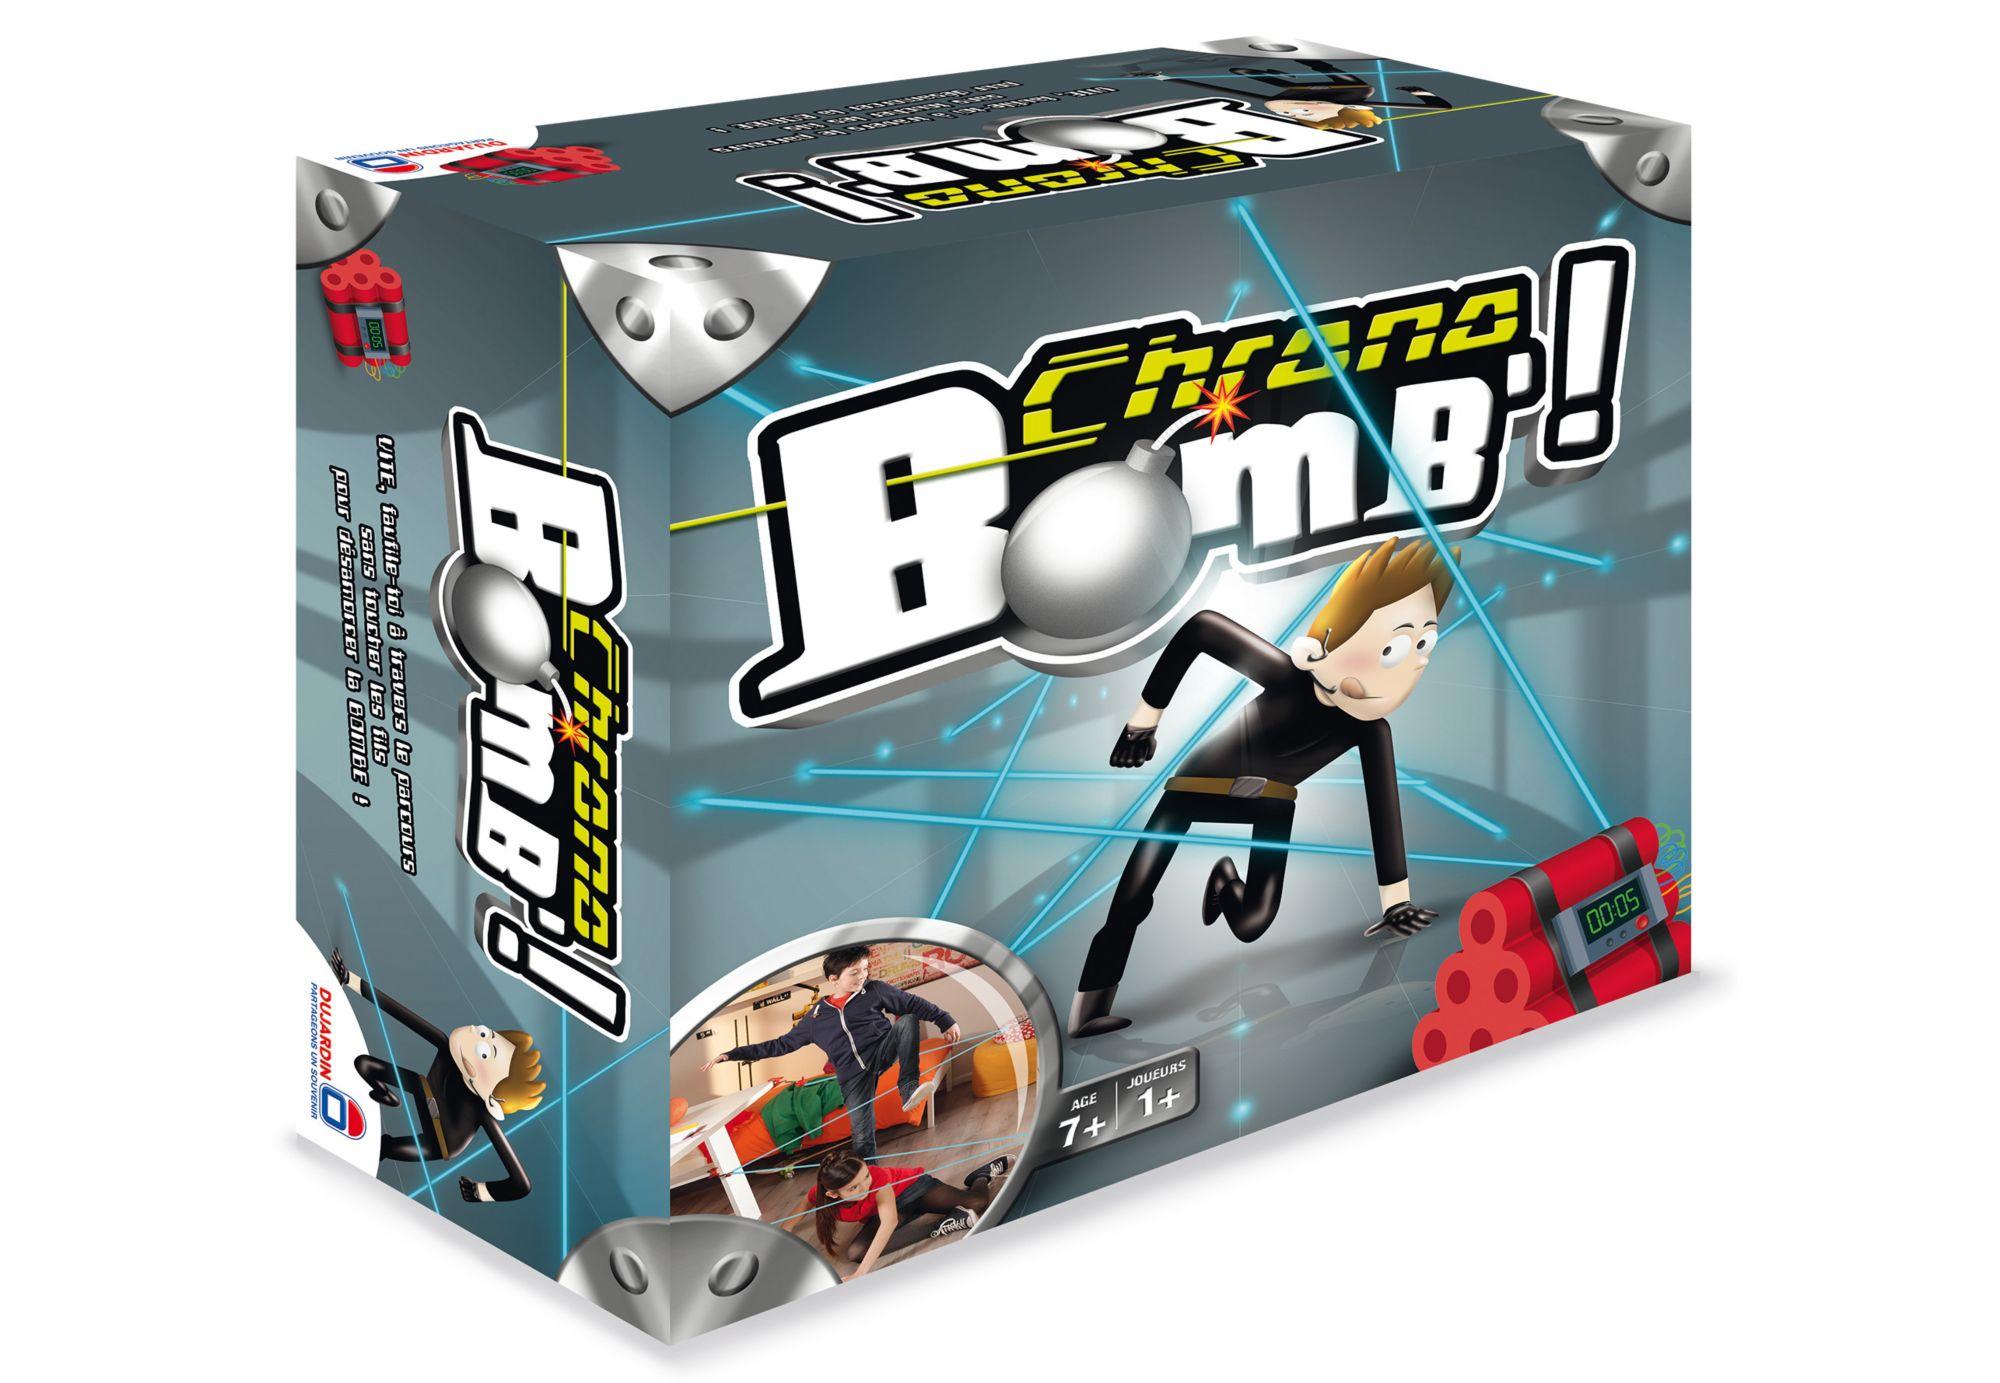 IMC TOYS IMC Toys Geschicklichkeitsspiel, »Chrono Bomb«